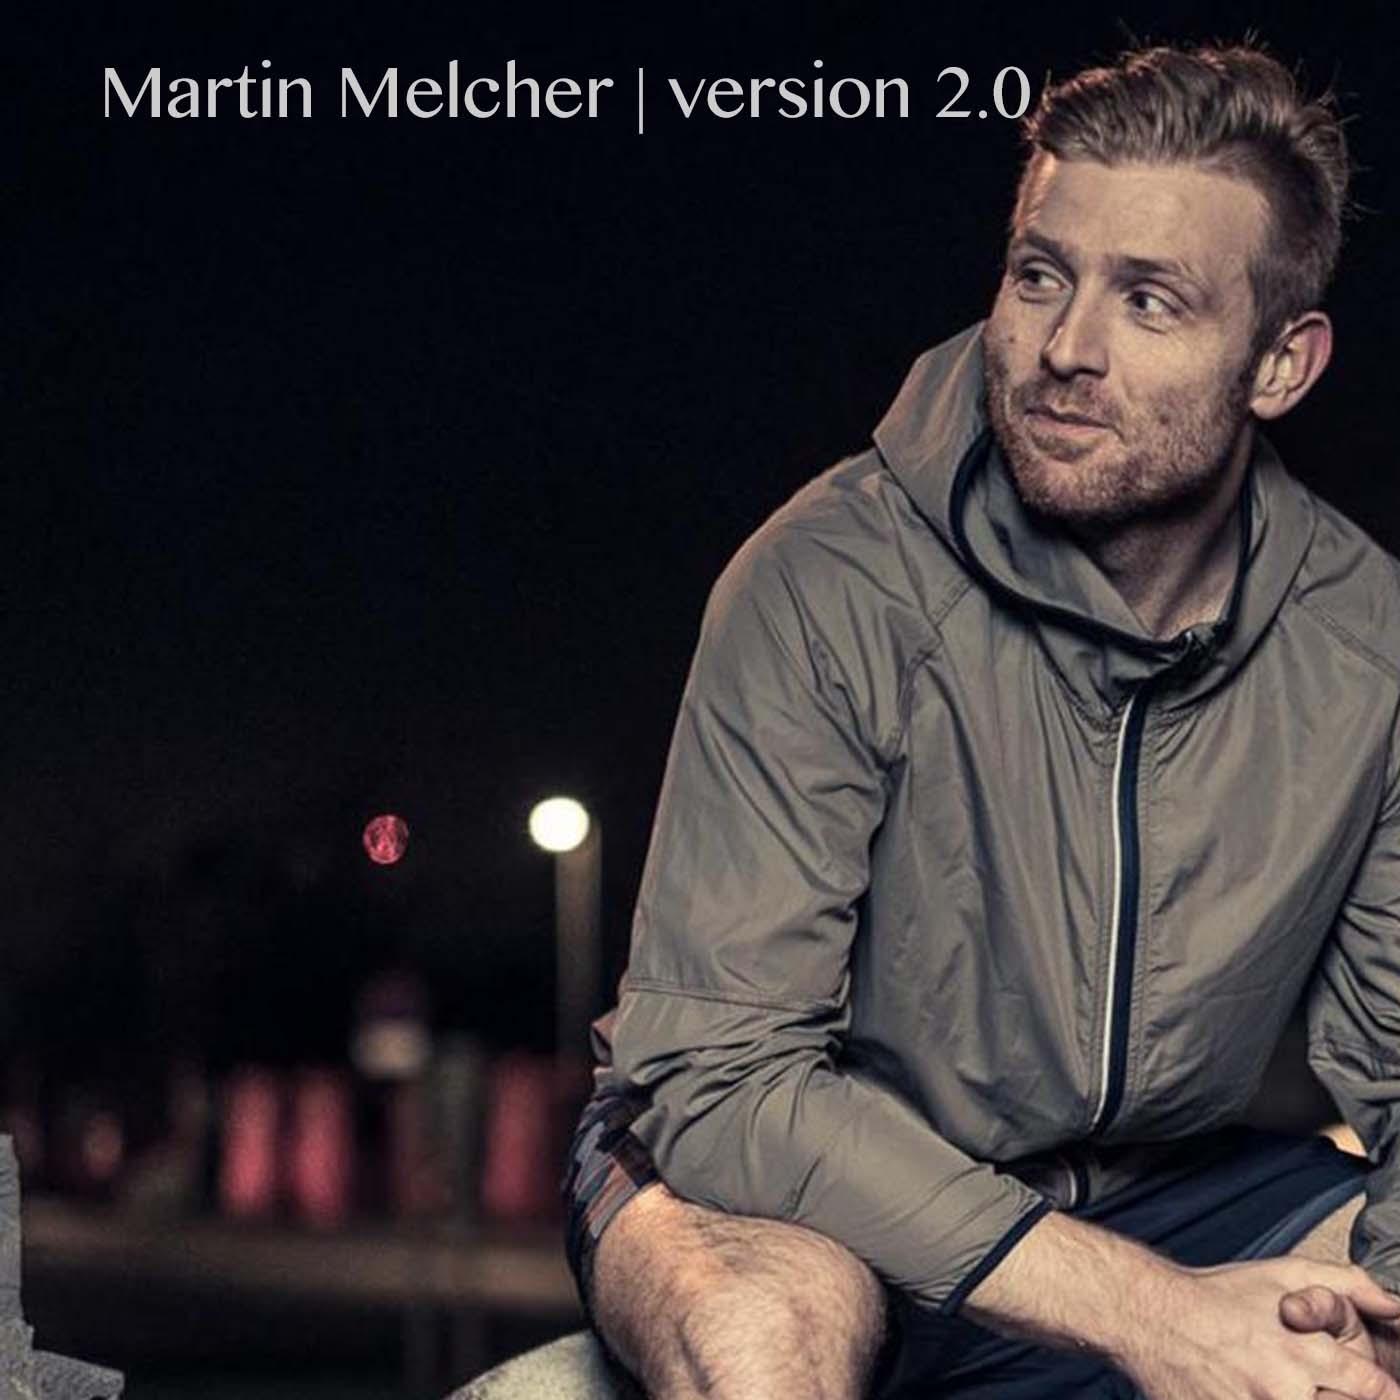 Martin Melcher | Version 2.0 show art